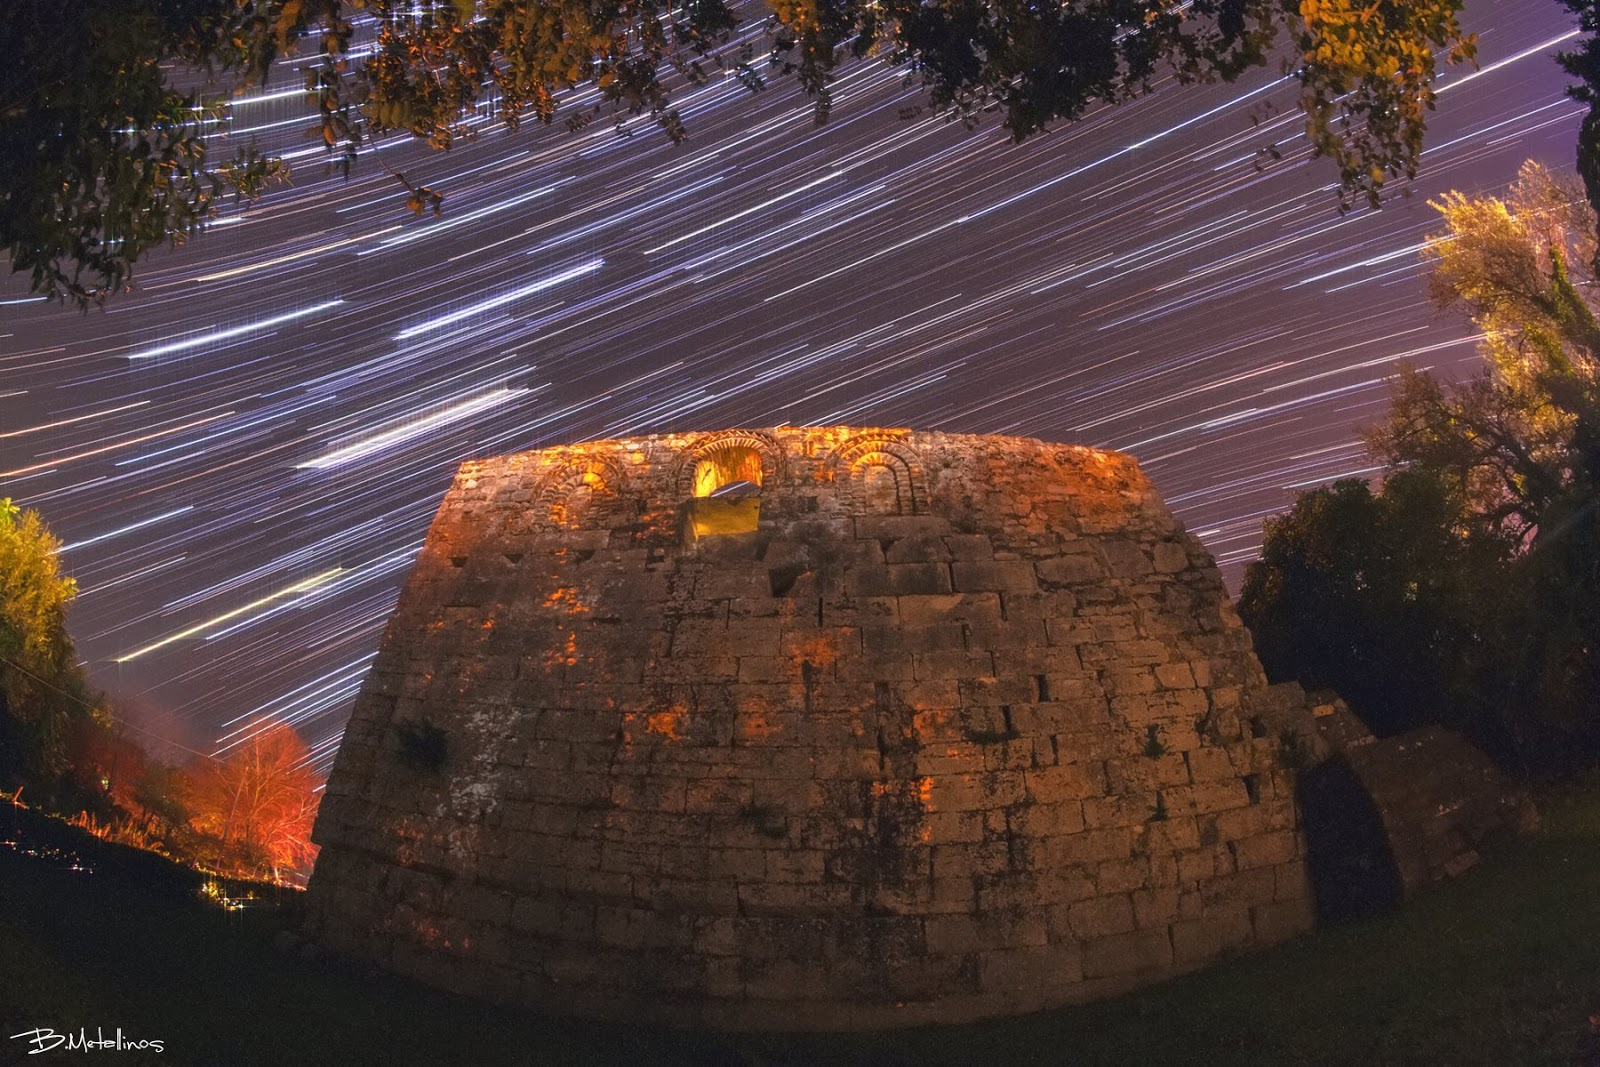 Photo Credit: Βασίλης Μεταλληνός